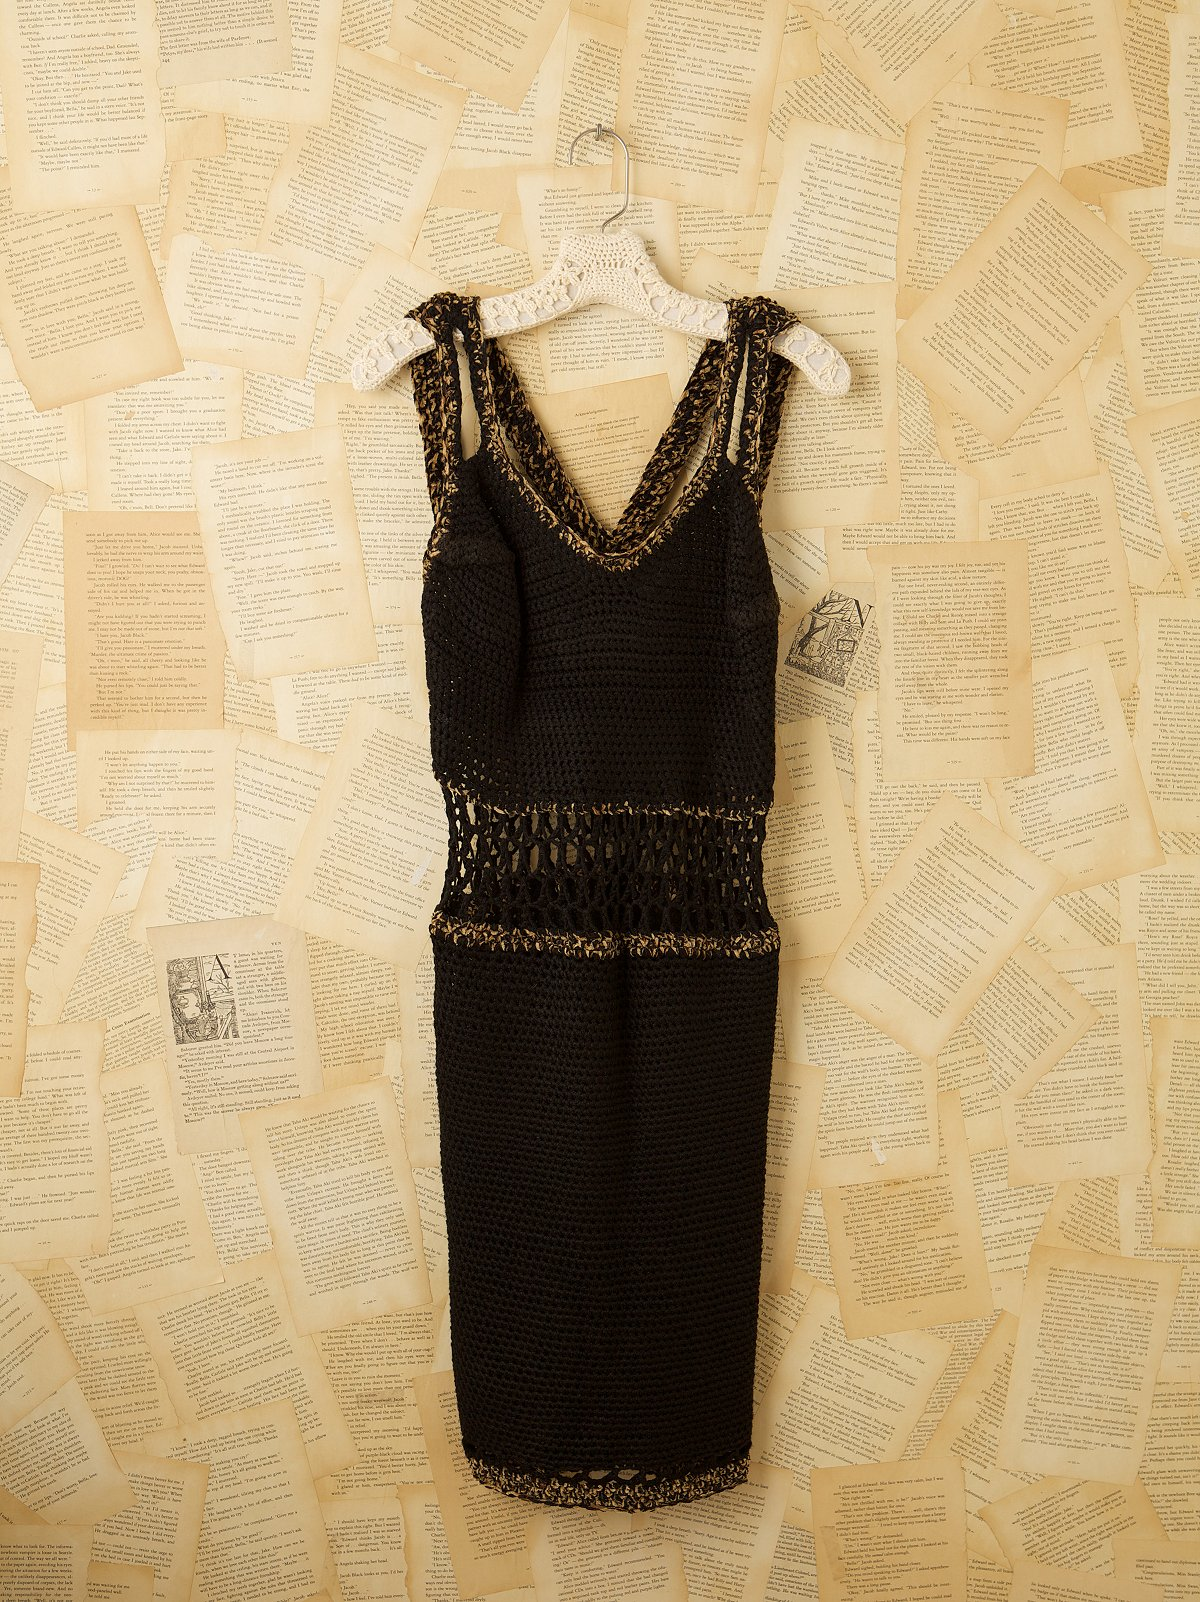 Vintage Hand Knit Dress